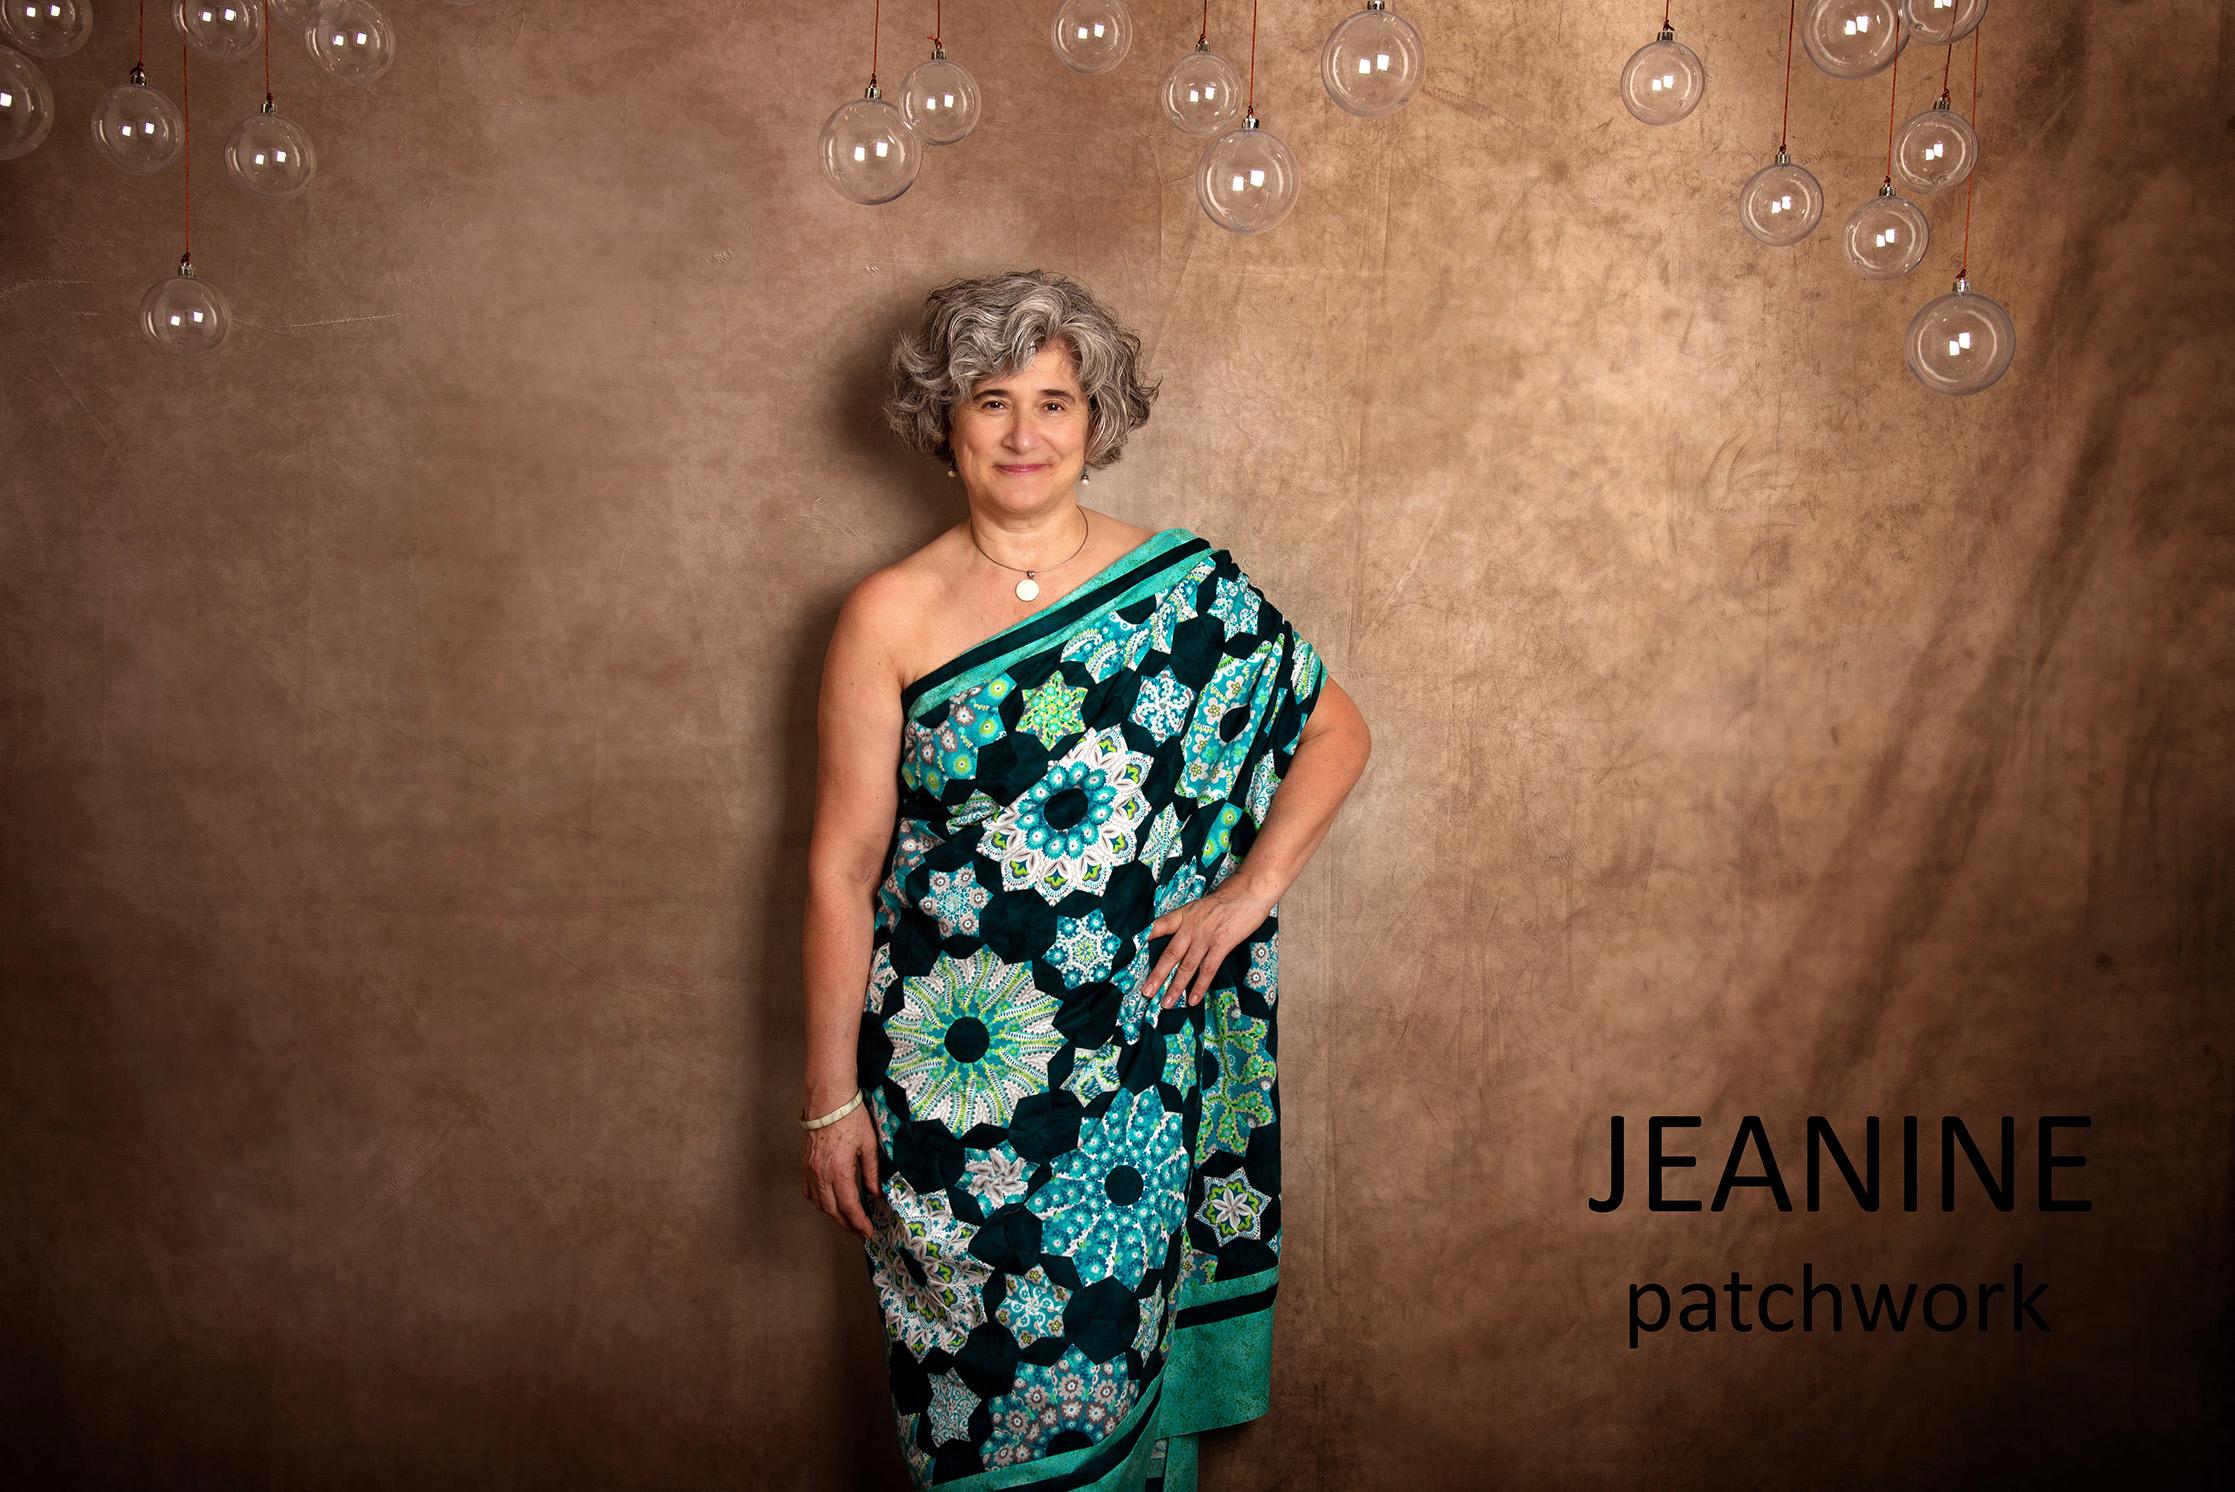 Jeanine: patchwork